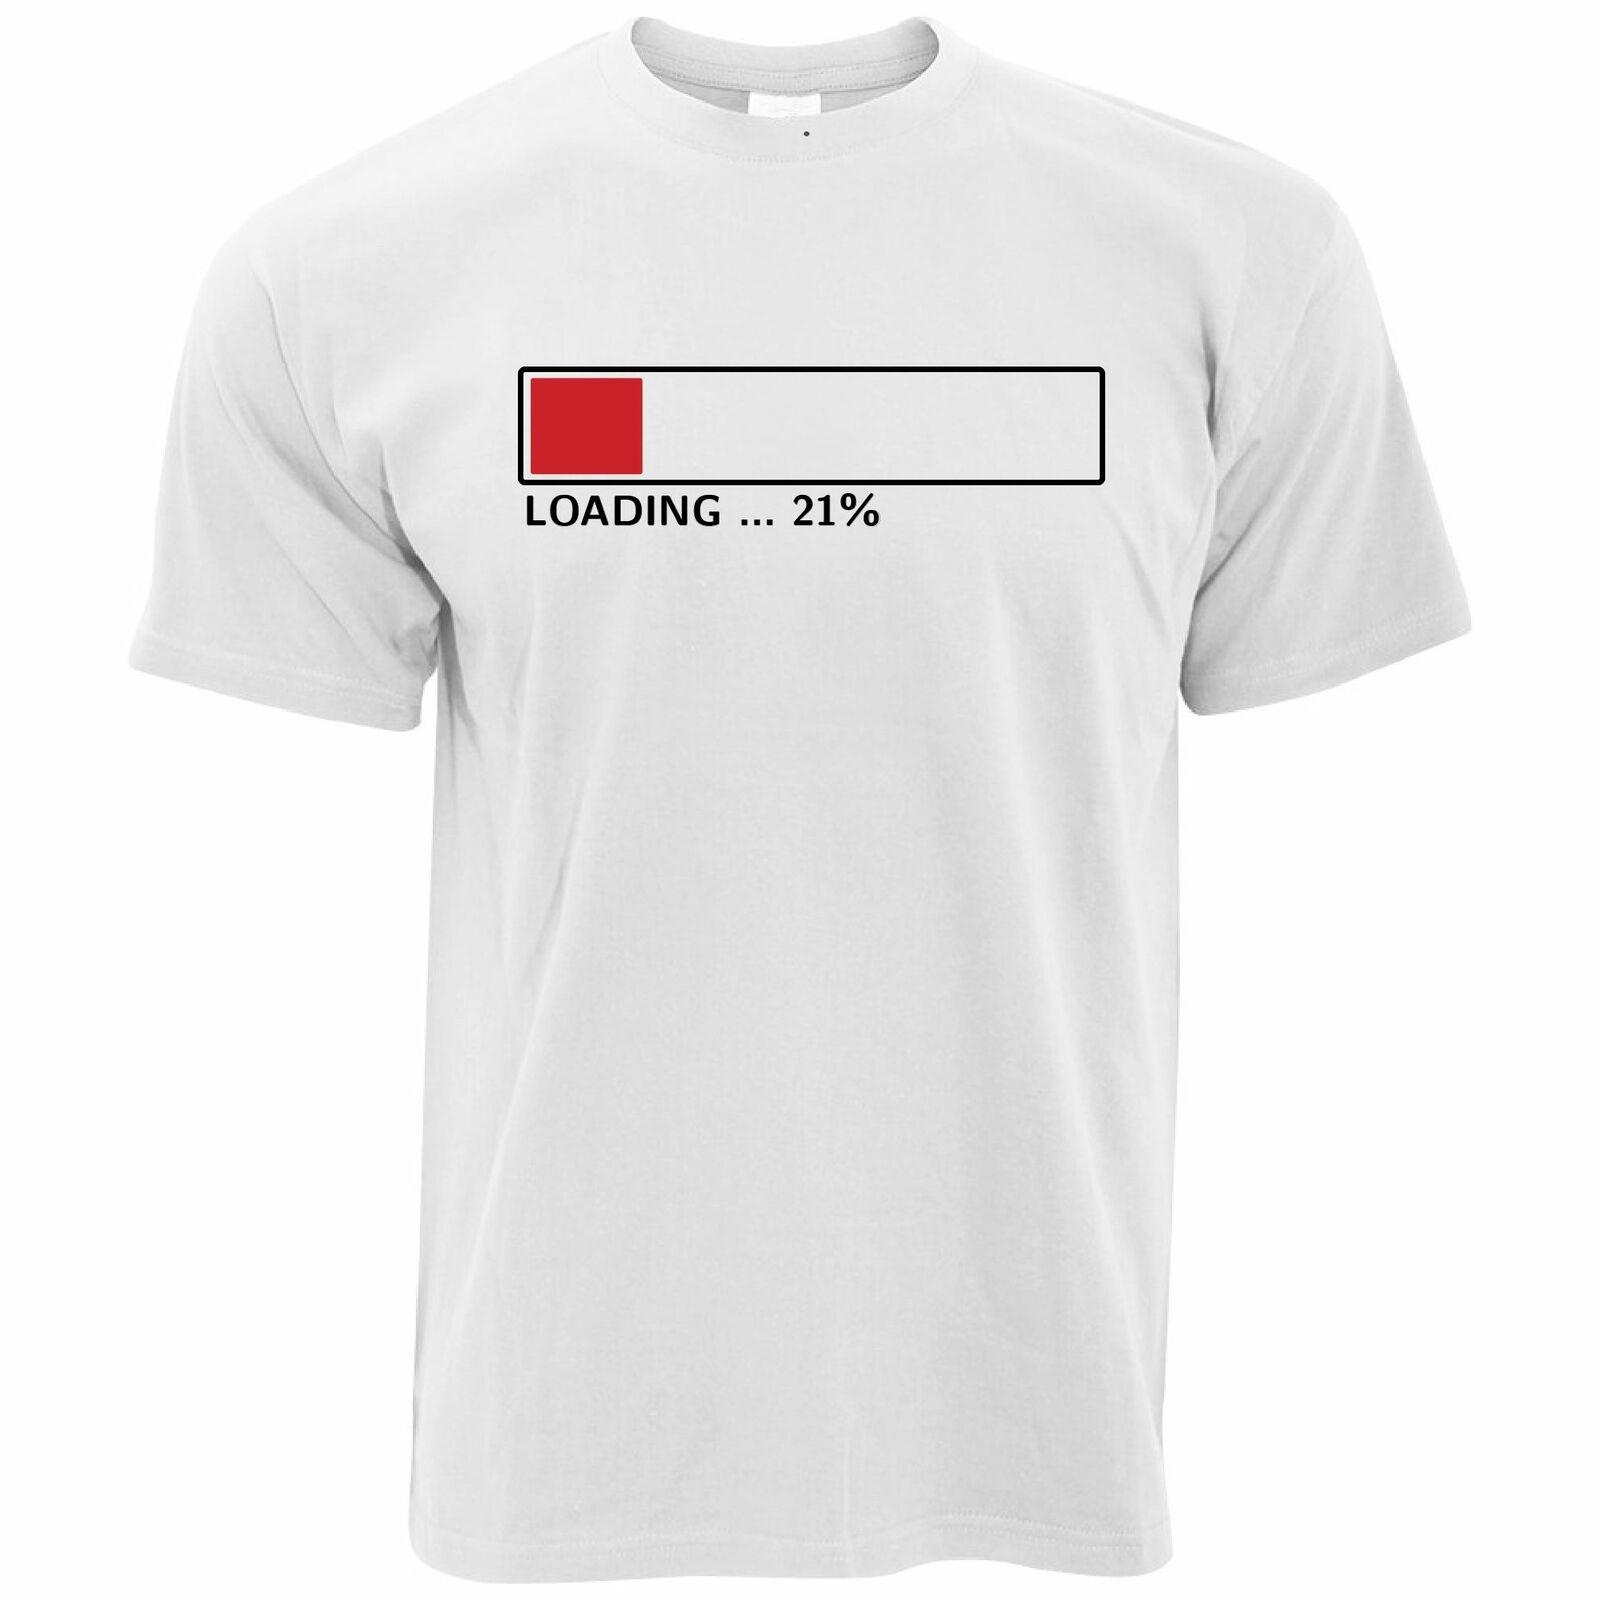 21st cumpleaños camiseta carga 21% completa Twenty One regalo divertida computadora